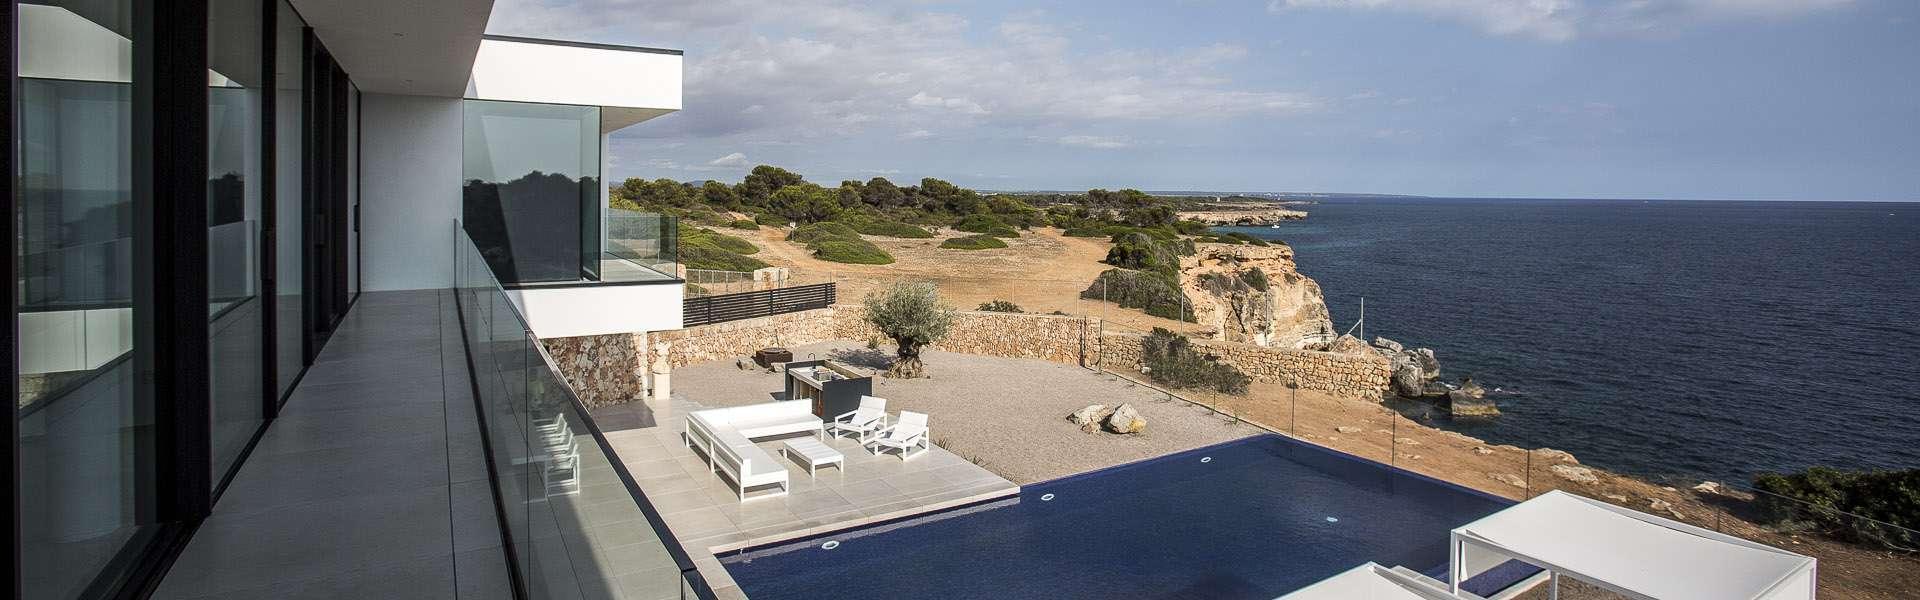 Cala Pi -  Exclusive villa at the seaside